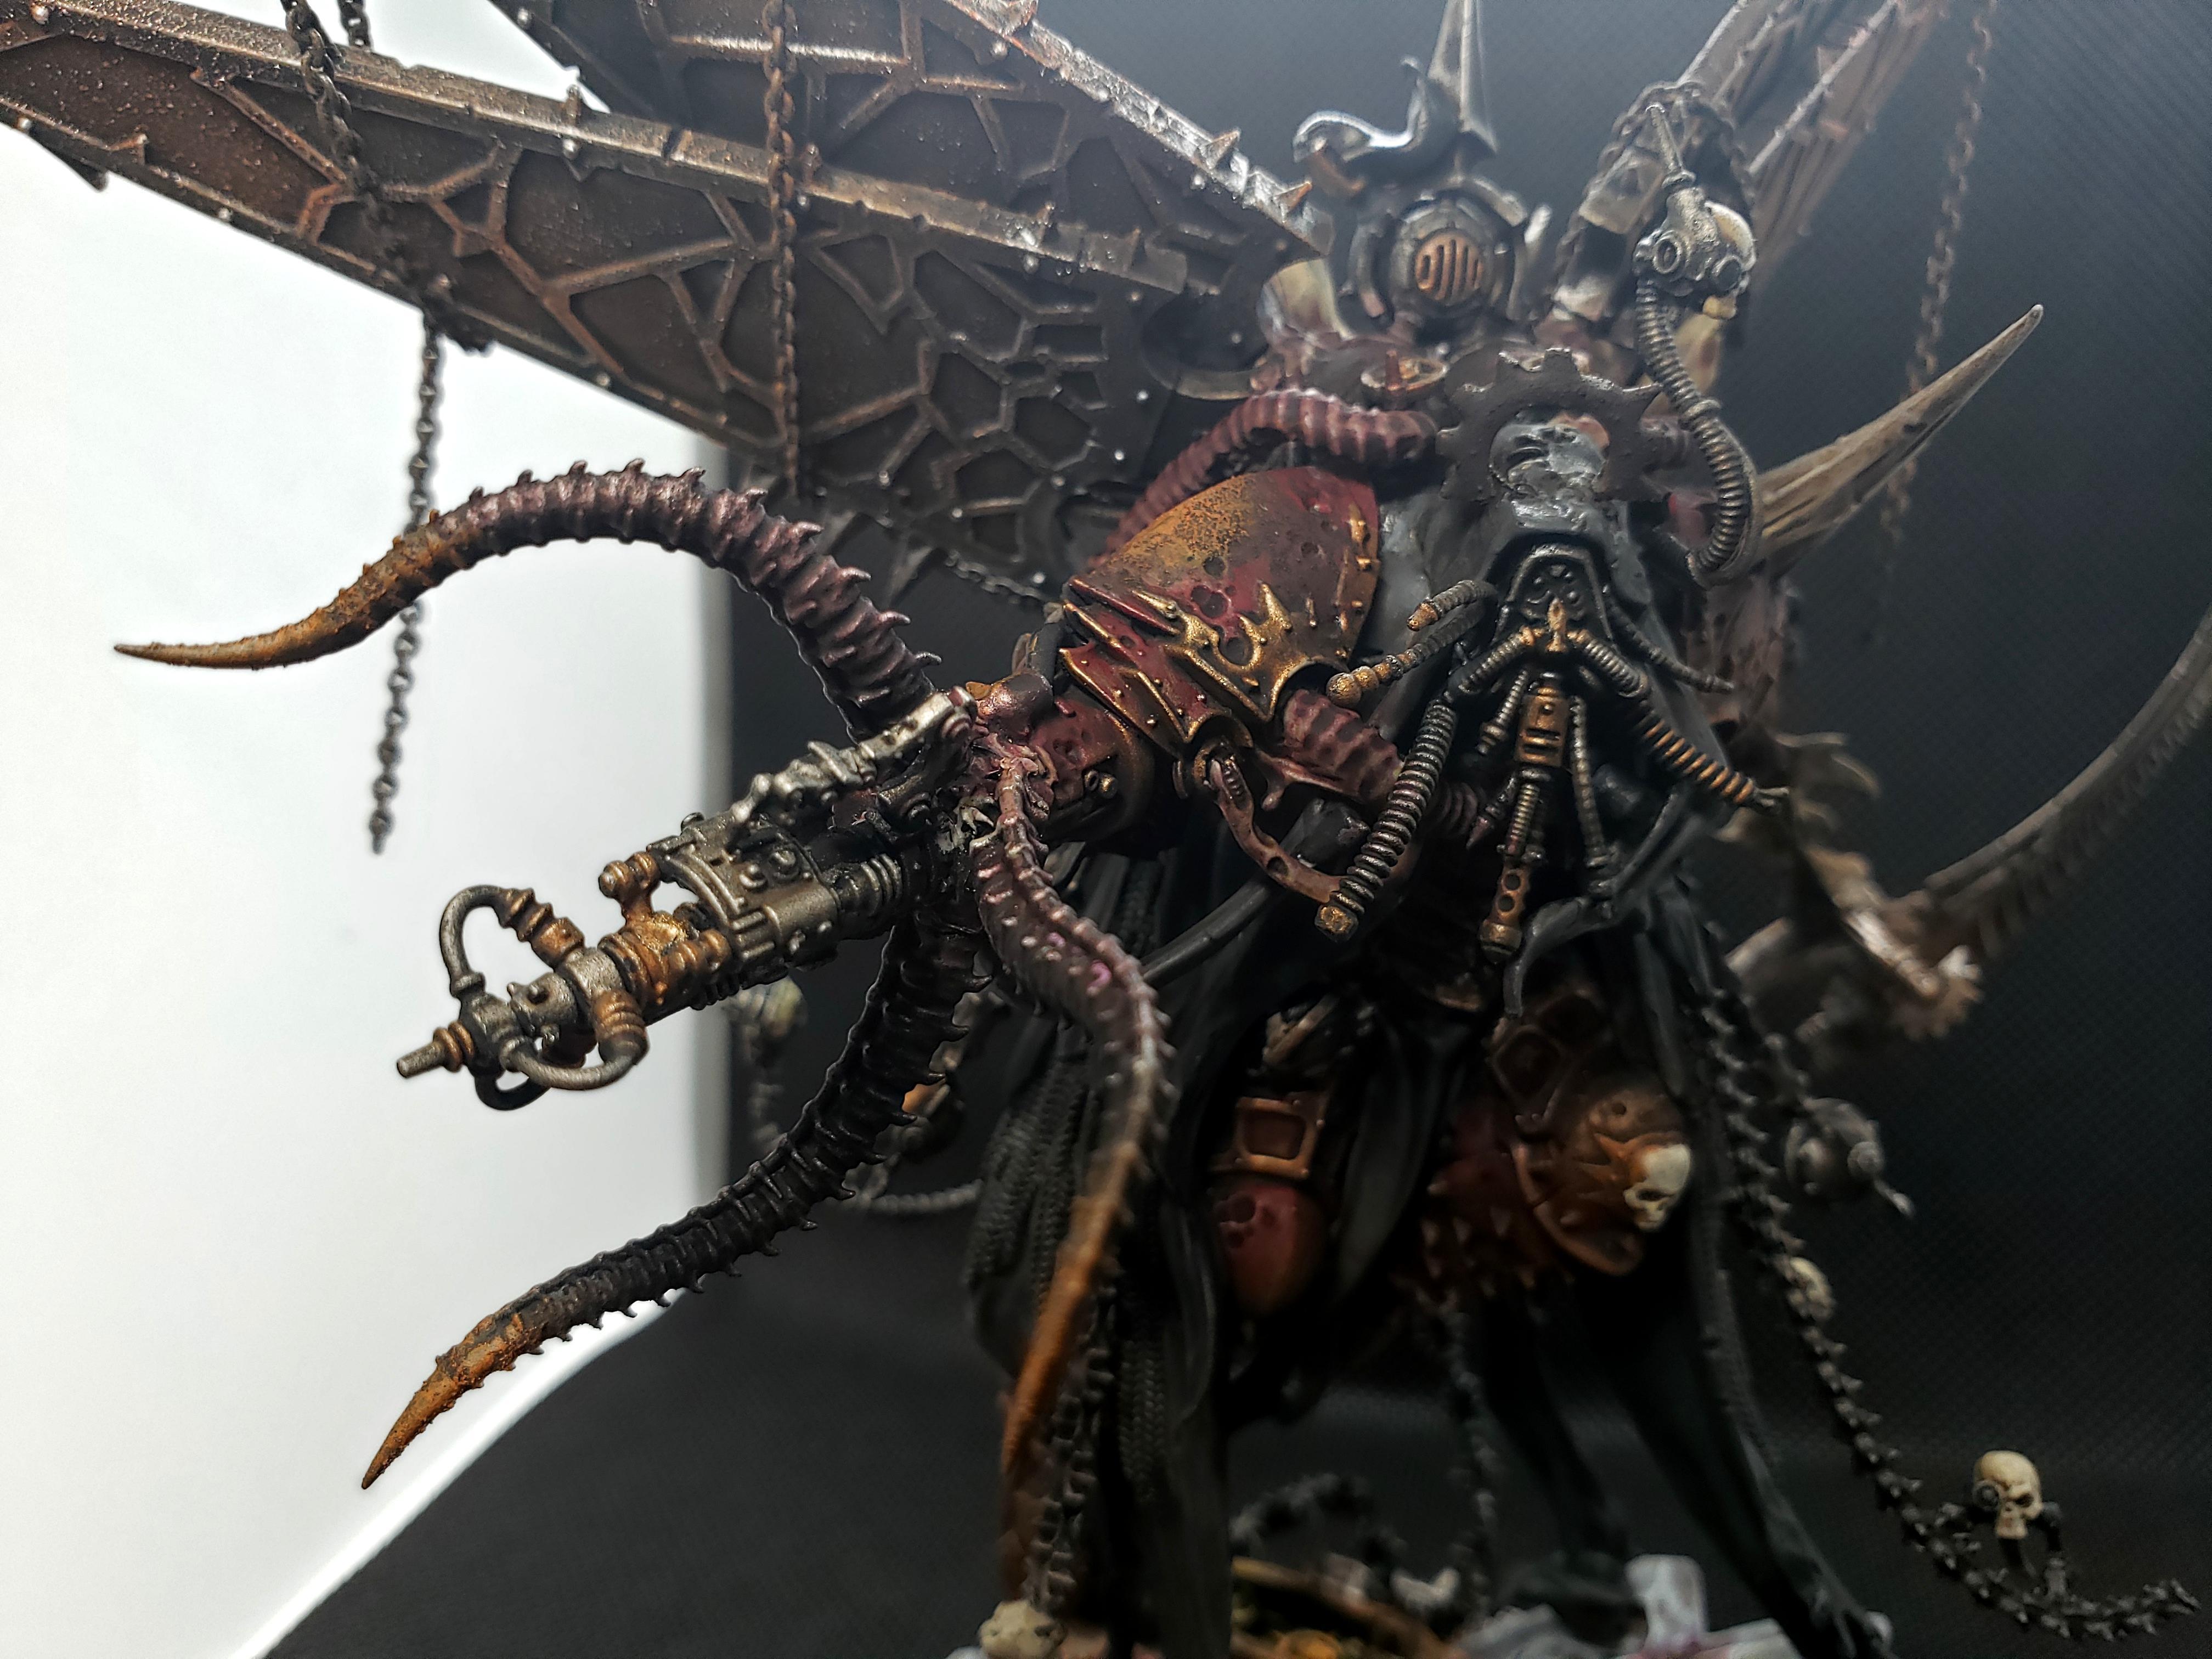 Adeptus Mechanicus, Admech, Conversion, Dark Mechanicum, Darkmech, Death Guard, Kitbash, Mortarion, Warhammer 40,000, Warhammer Fantasy